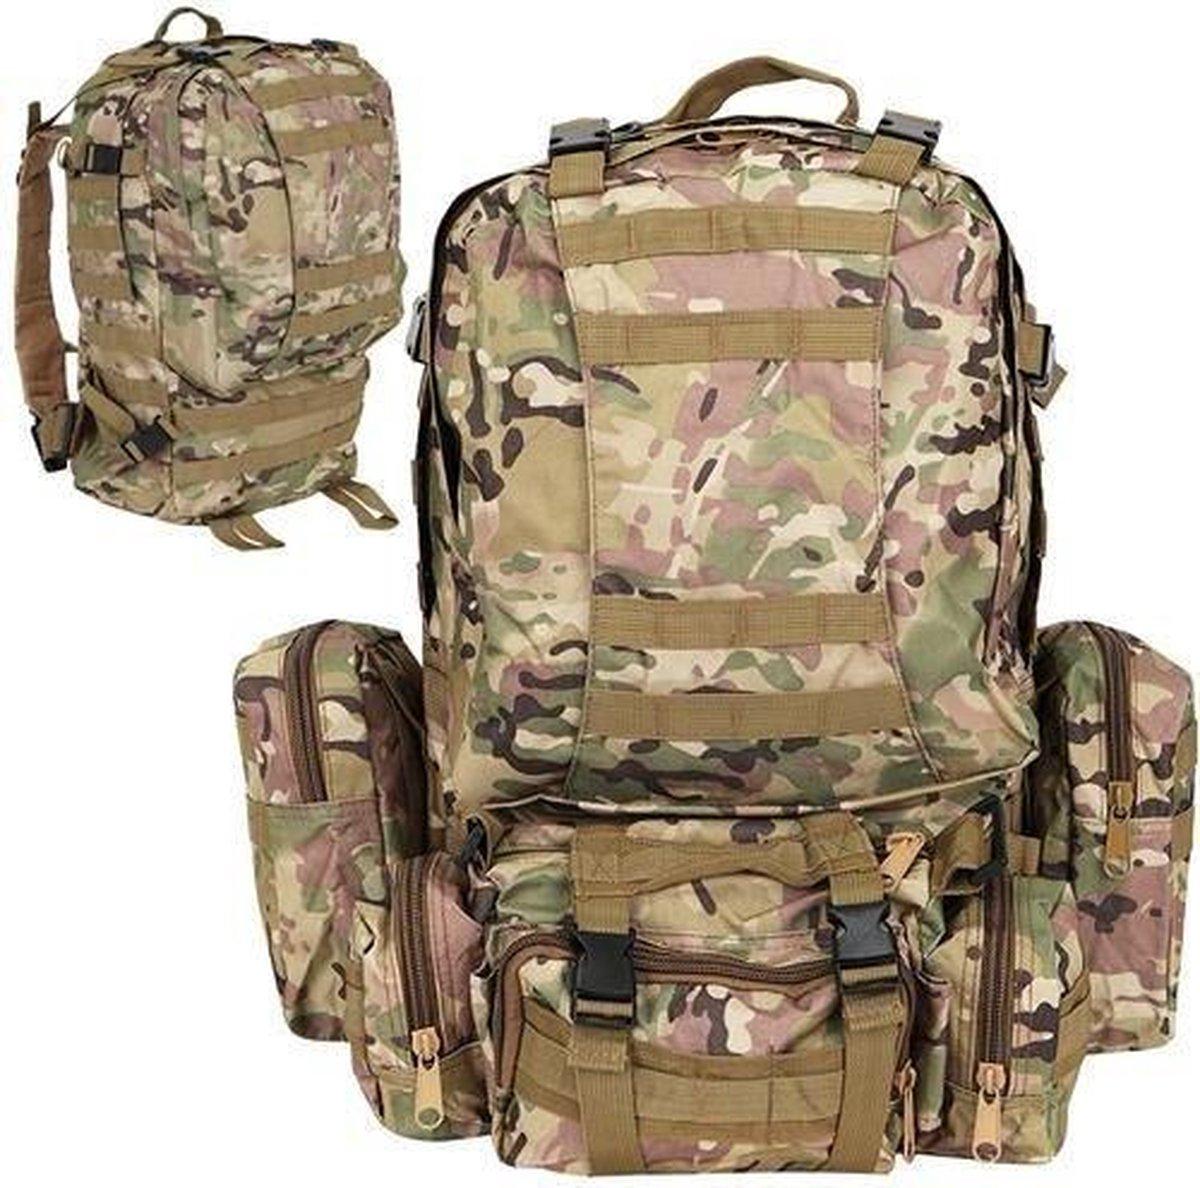 Leger Rugzak Tactical Backpack - Camouflage Rugzak - Backpack Militair